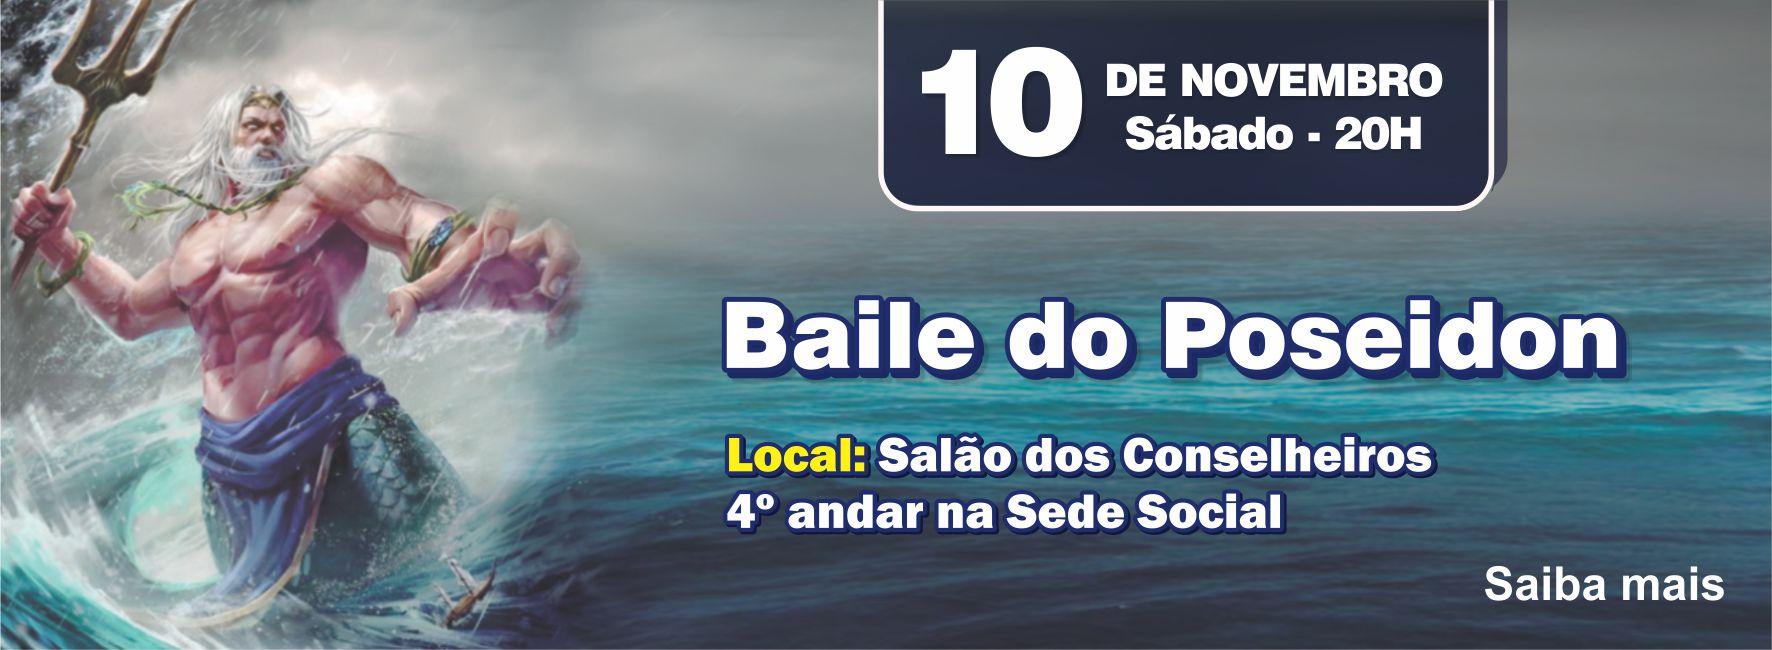 https://www.clubenaval.org.br/novo/baile-do-poseidon